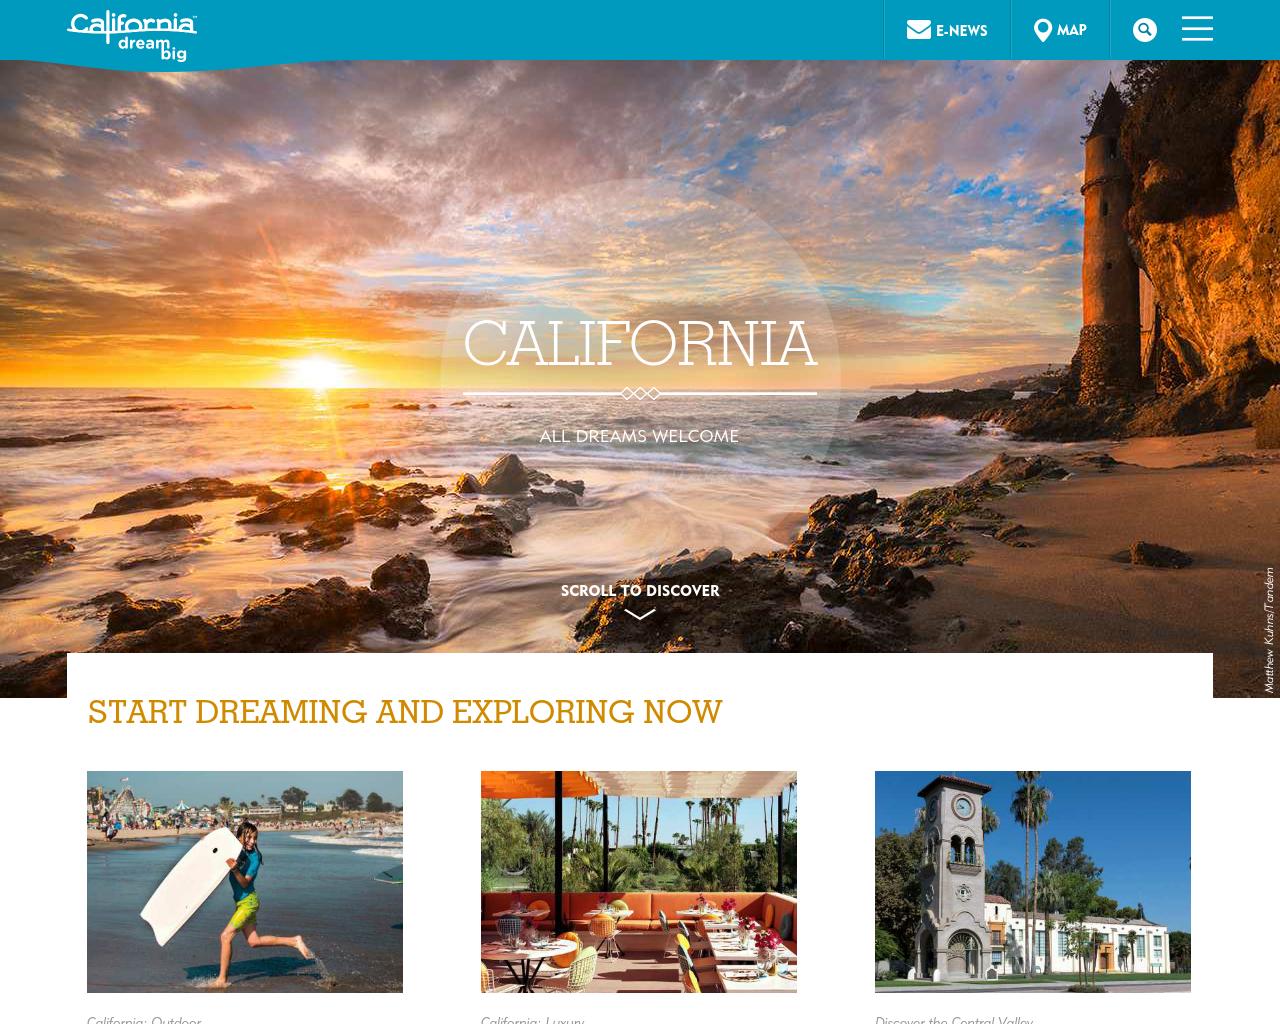 California-Dream-Big-Advertising-Reviews-Pricing